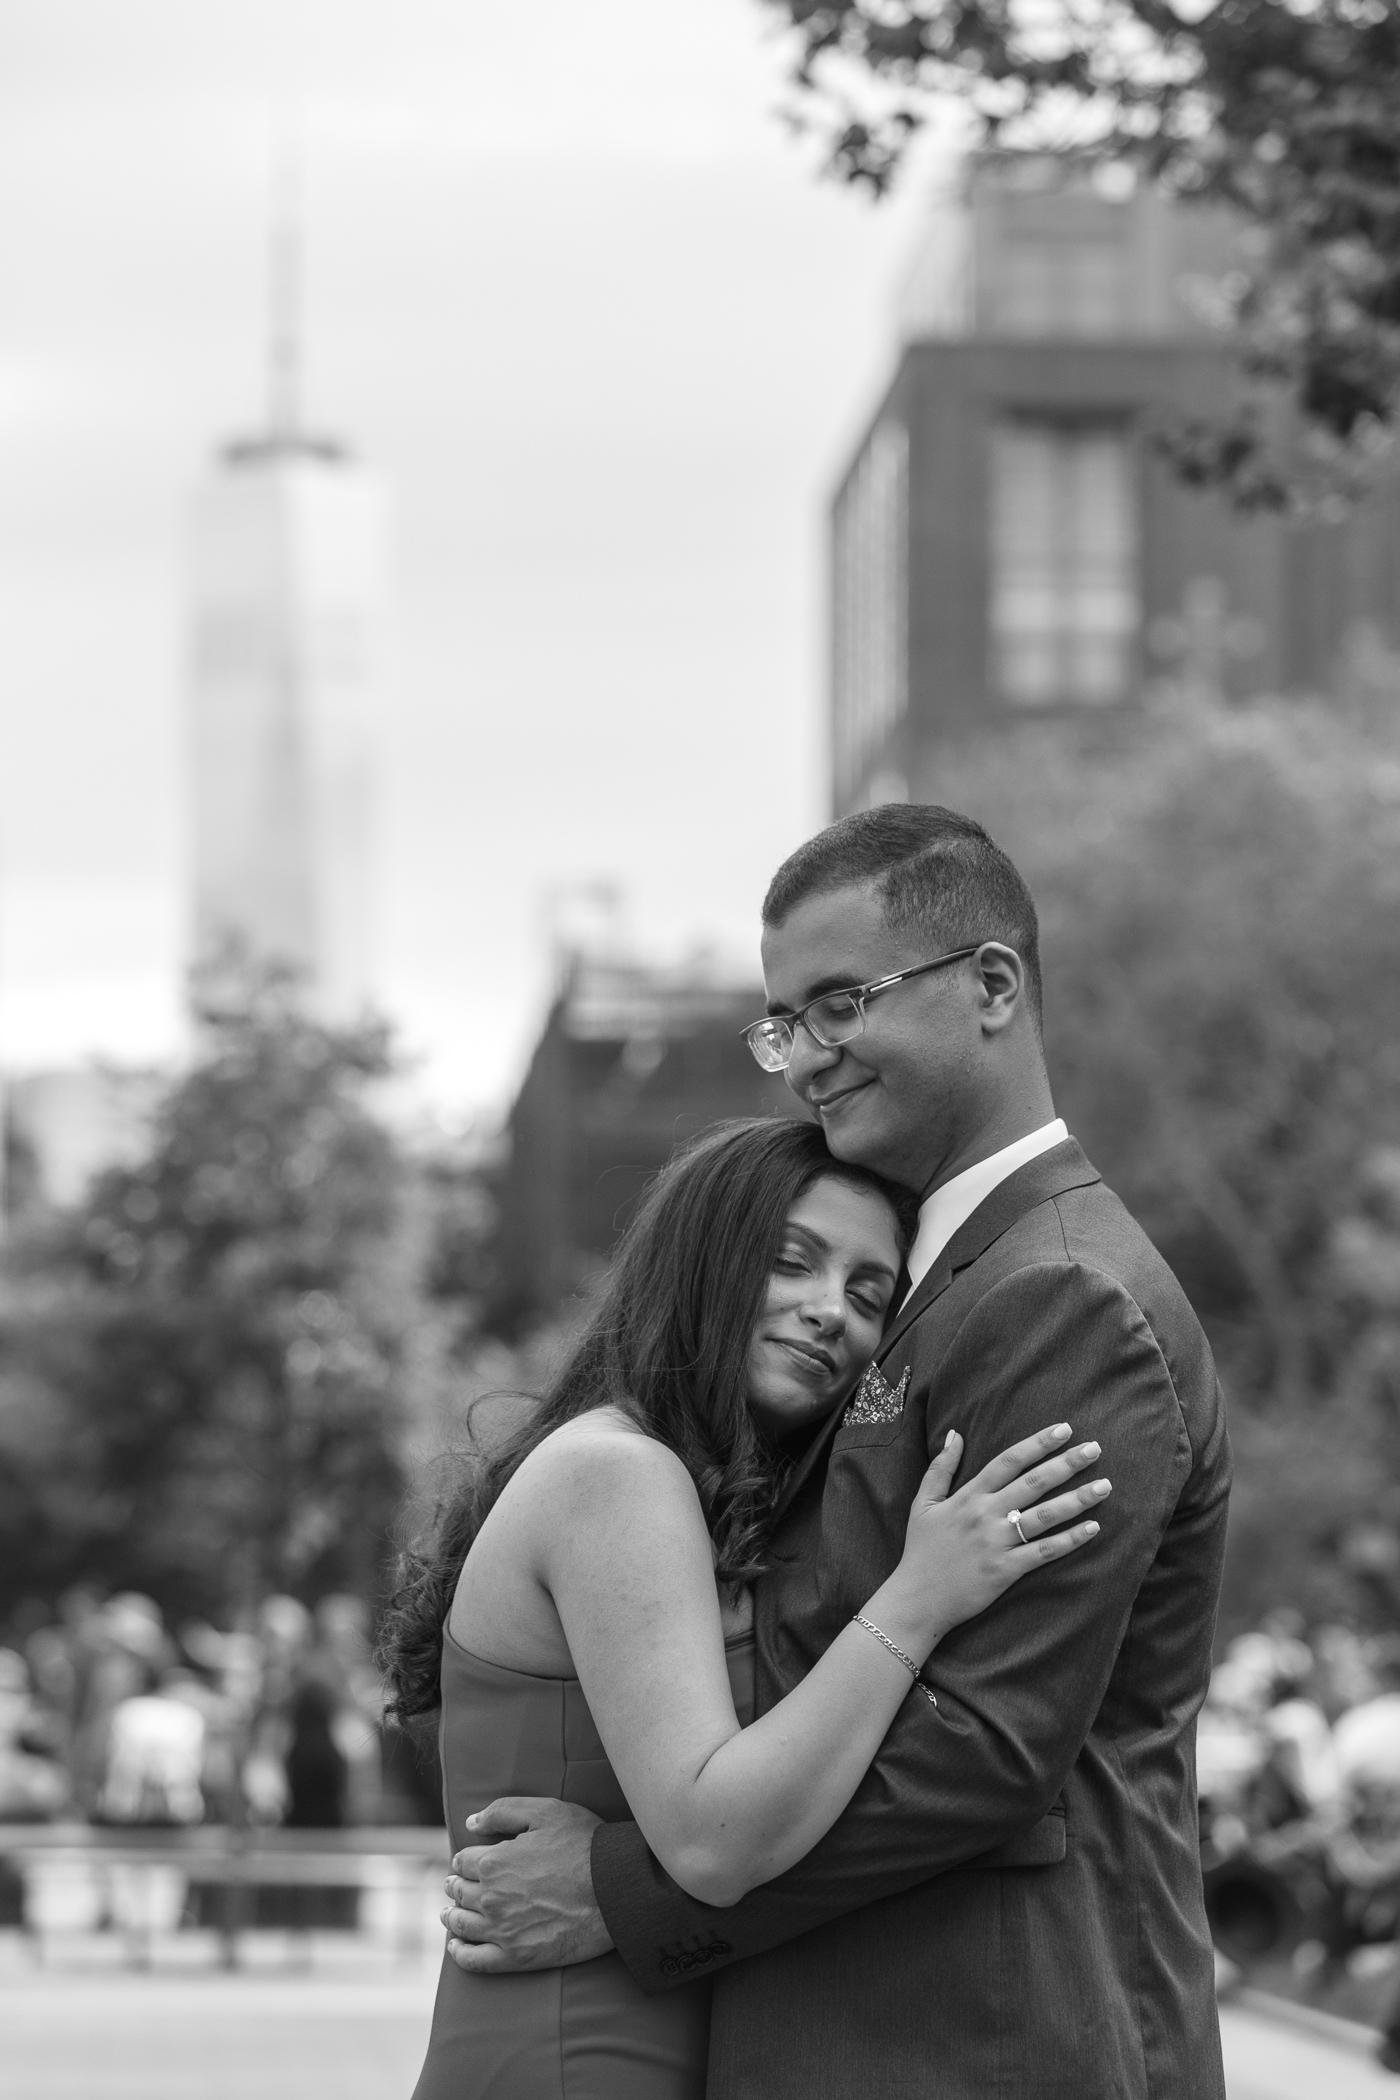 Kiro Rebecca Washington Square Park Marriage Proposal _ Jonathan Heisler _ 6152019 _038.jpg